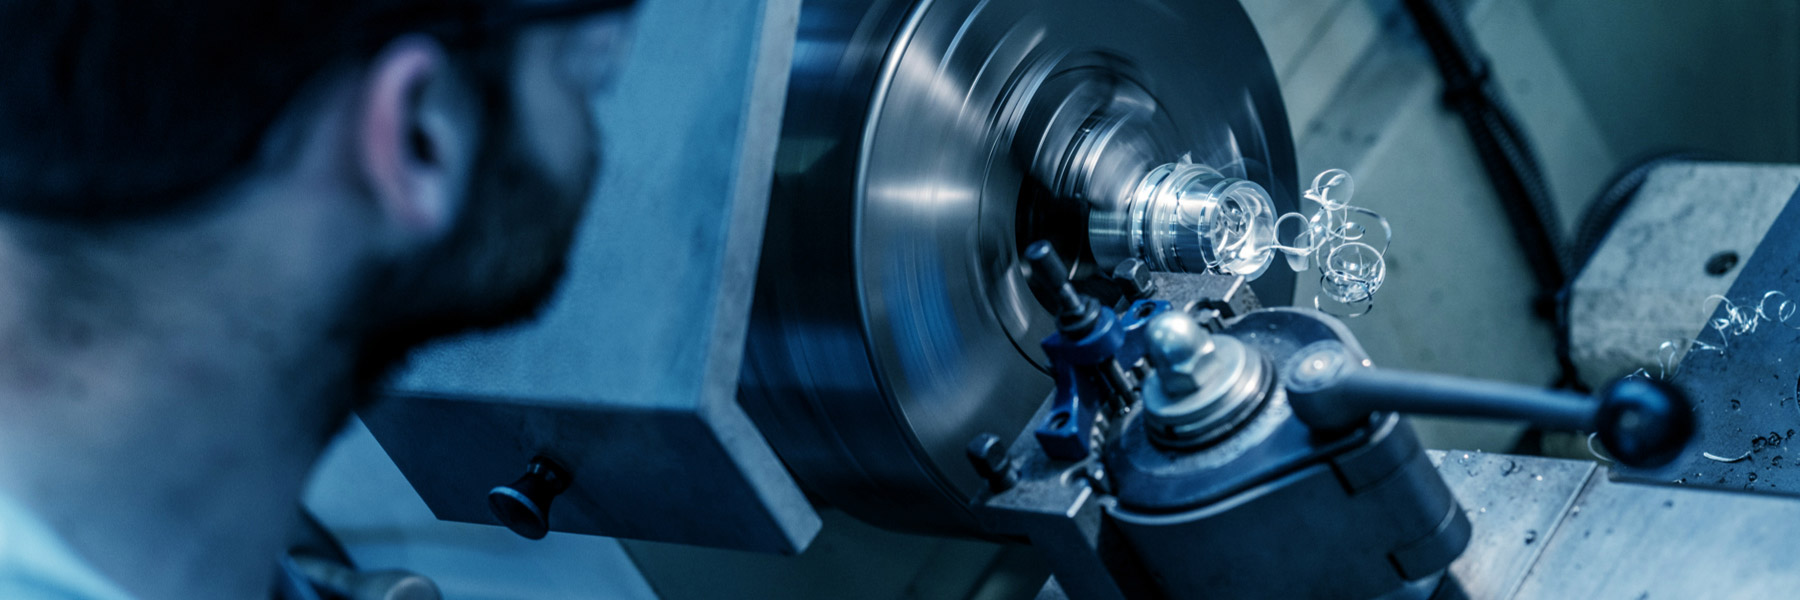 Hohl Maschinen- & Anlagenbau - Sondermaschinenbau